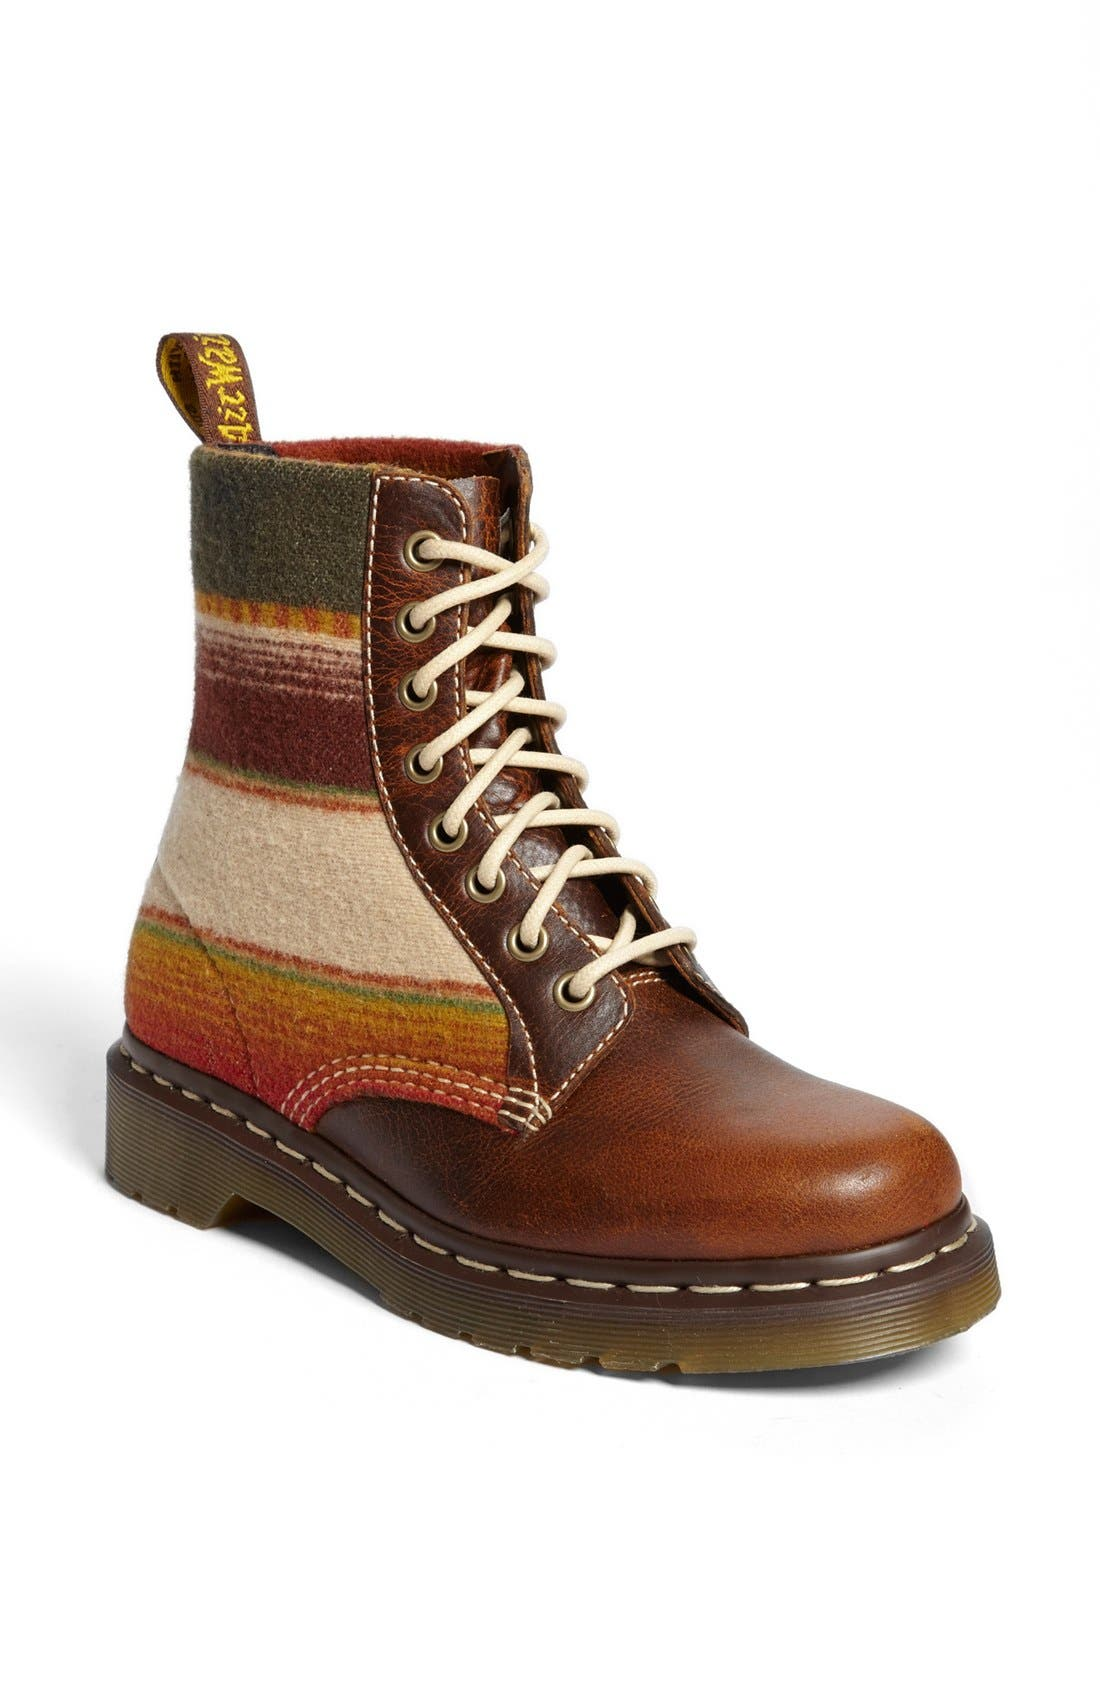 Alternate Image 1 Selected - Pendleton for Dr. Martens Boot